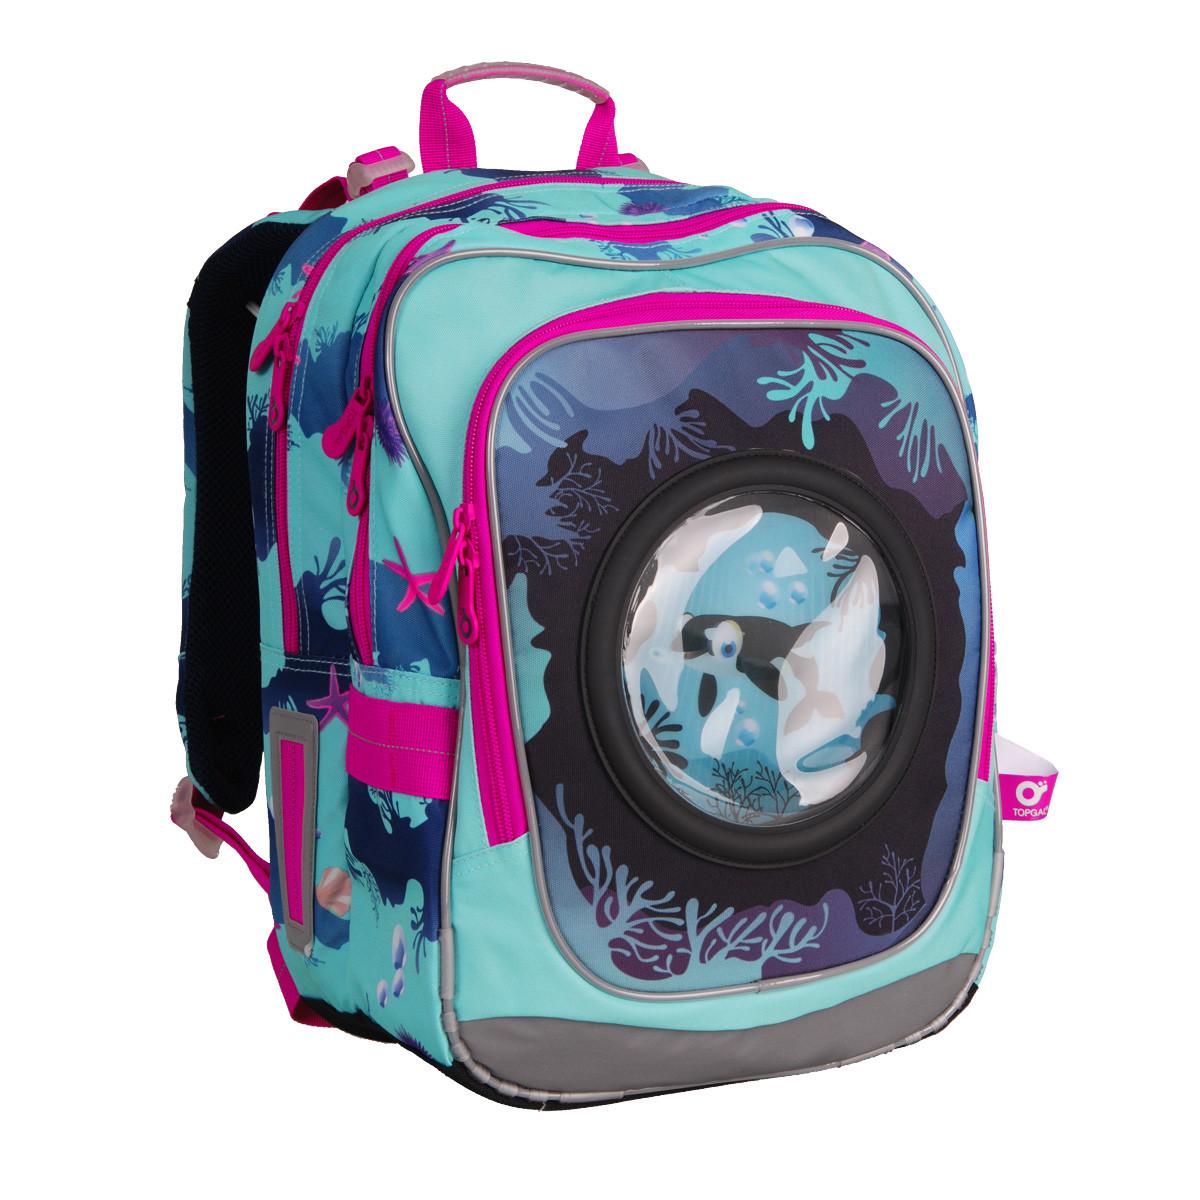 840d8a77fc7 Školní batoh Topgal - CHI 790 D Blue